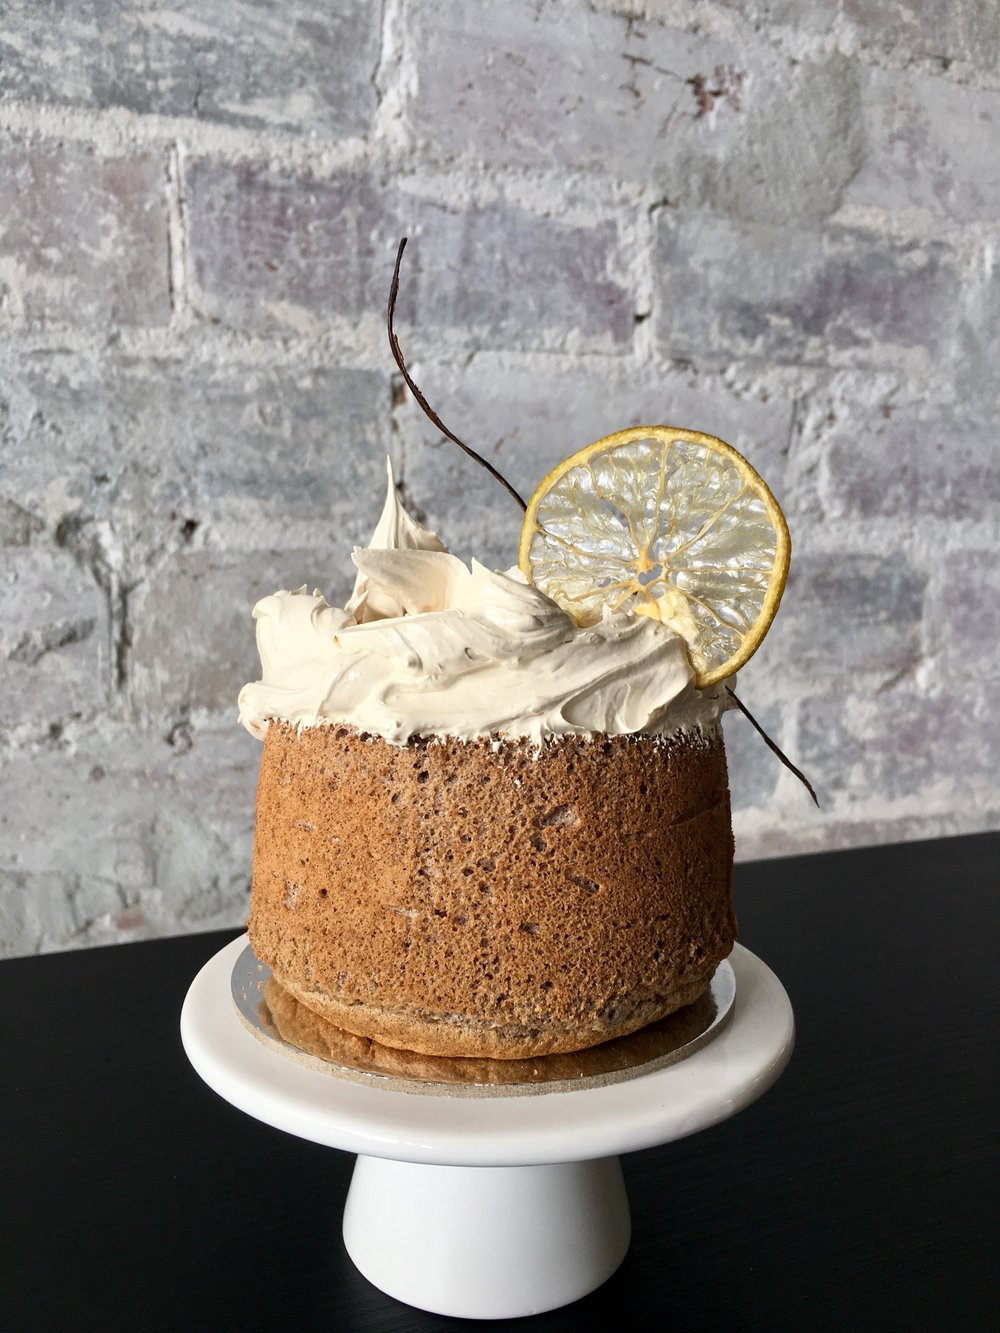 Citrus Meringue Chiffon - Fluffy lemon chiffon cake, with pillowy coconut sugar Italian meringue. Centre filled with luscious lemon curd.